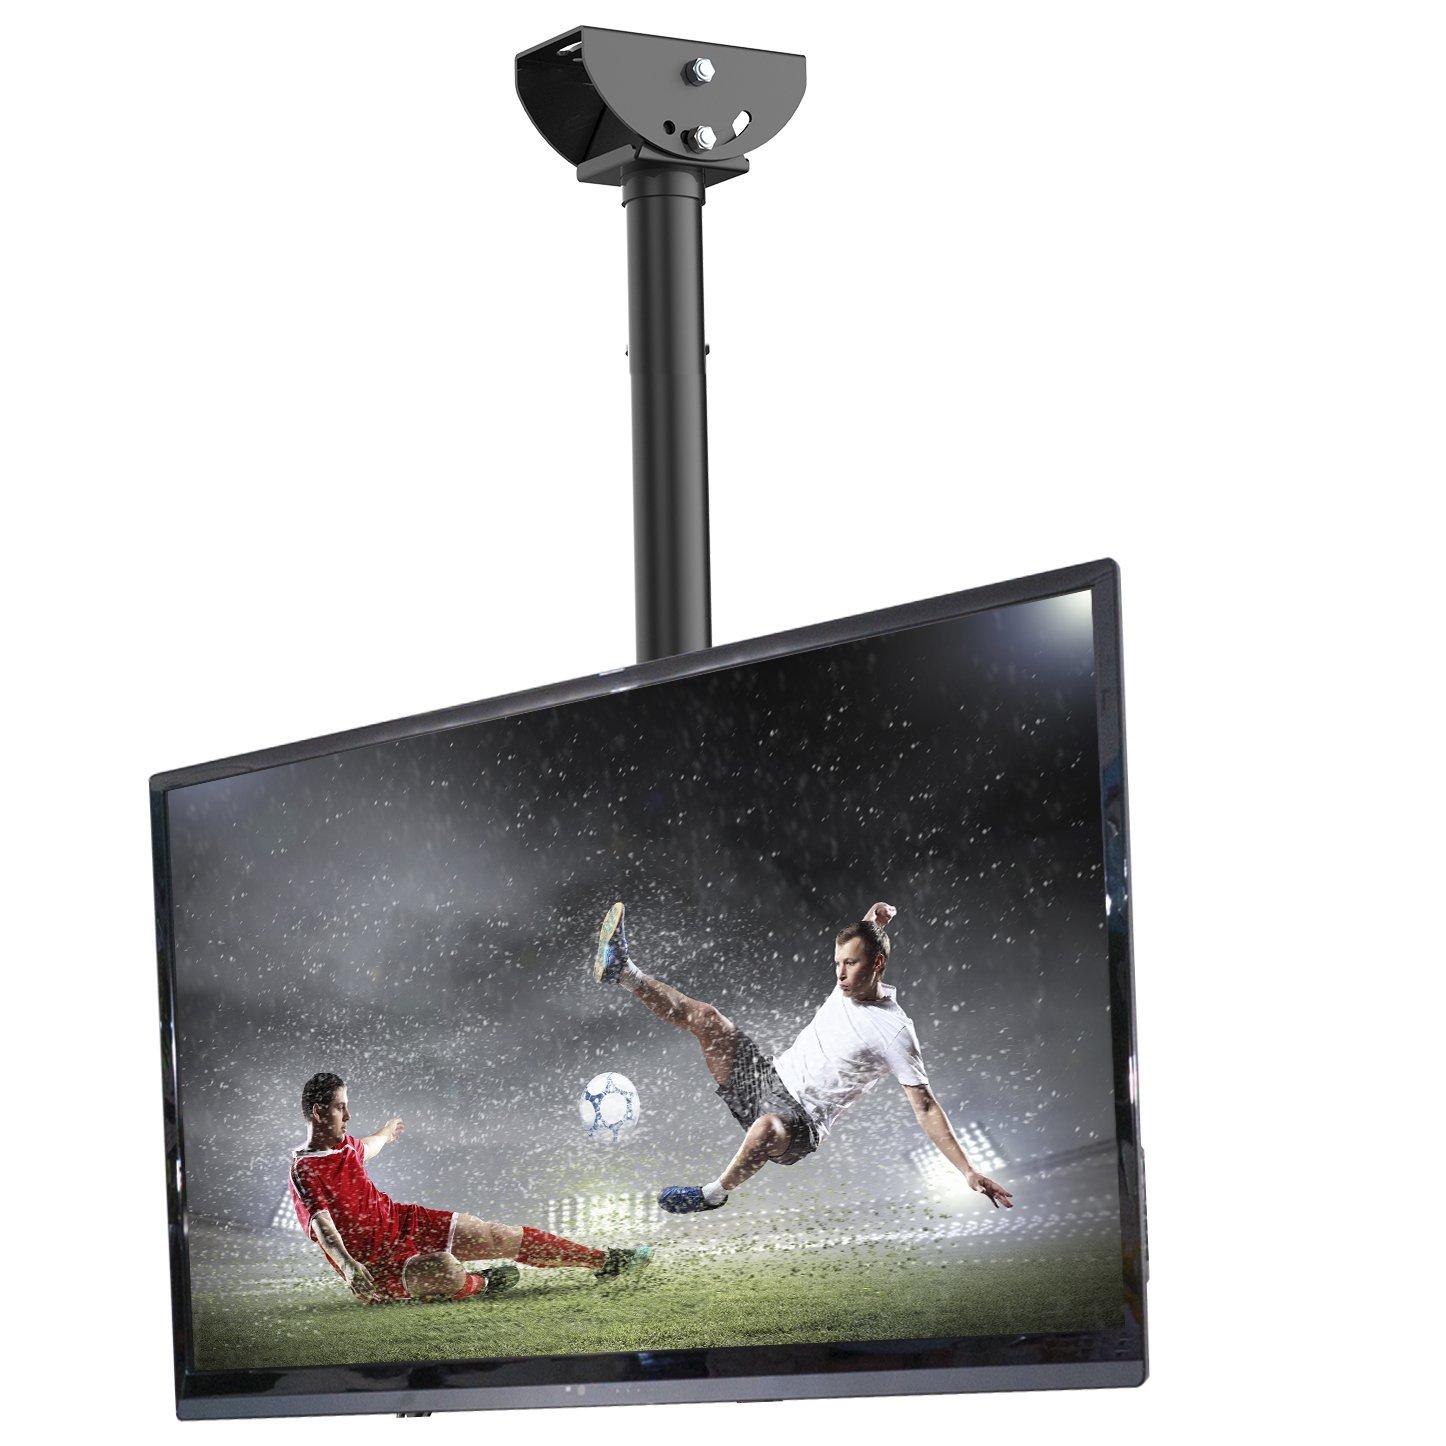 "Loctek CM1 Adjustable Tilting Wall Ceiling TV Mount Fits Most 26-55"" LCD LED Plasma Monitor Flat Panel Screen Display"